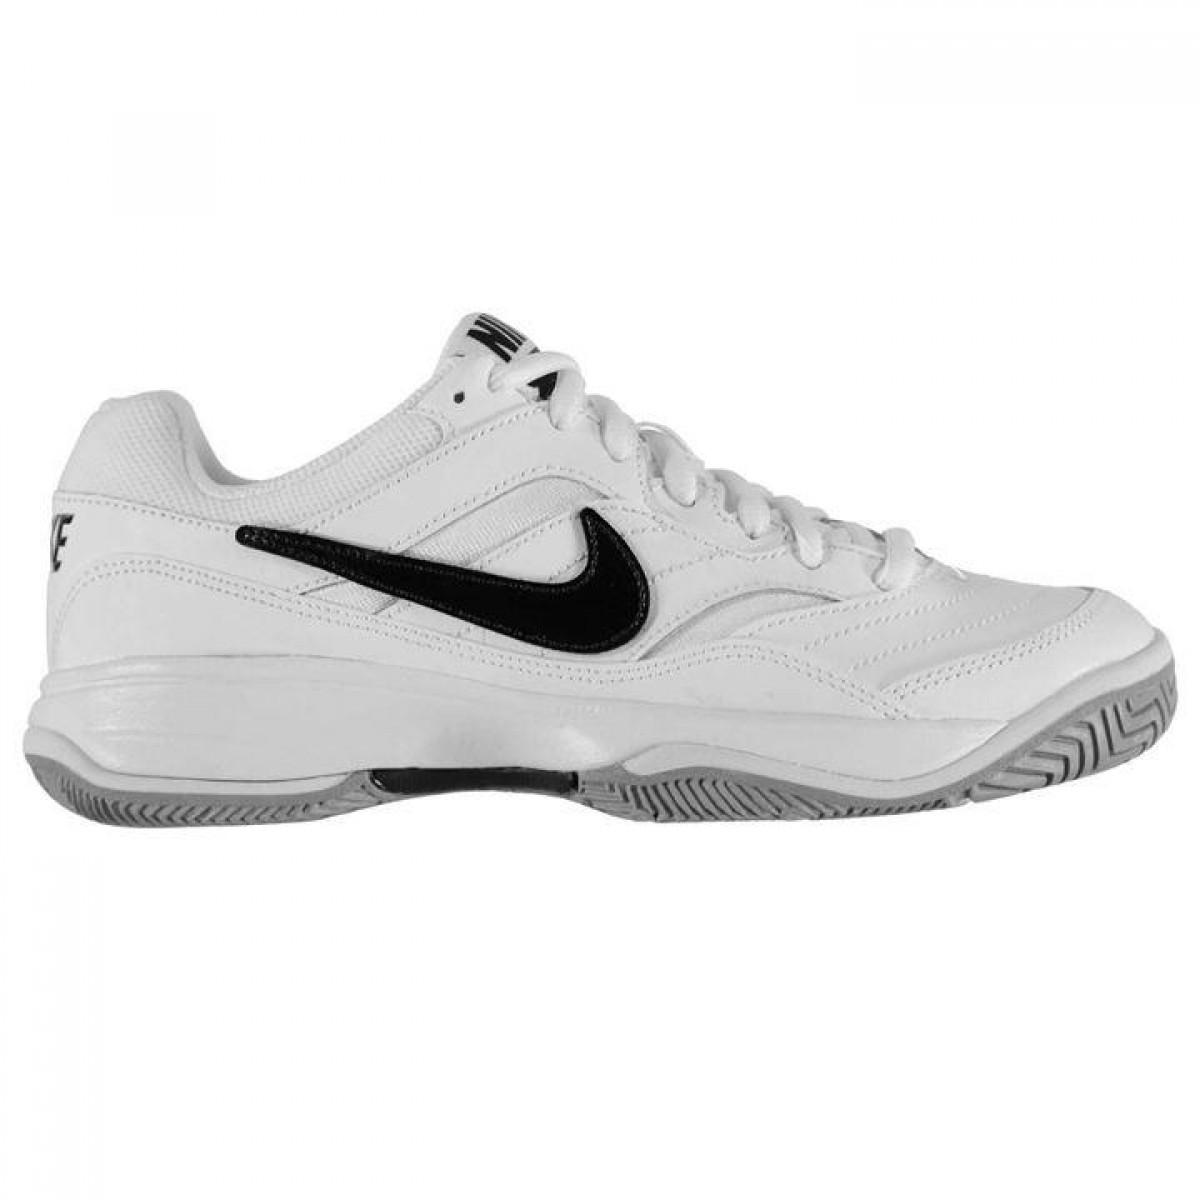 89f9ebda794c Кроссовки Nike Court Lite Tennis Trainers White Black - Оригинал - FAIR -  оригинальная одежда